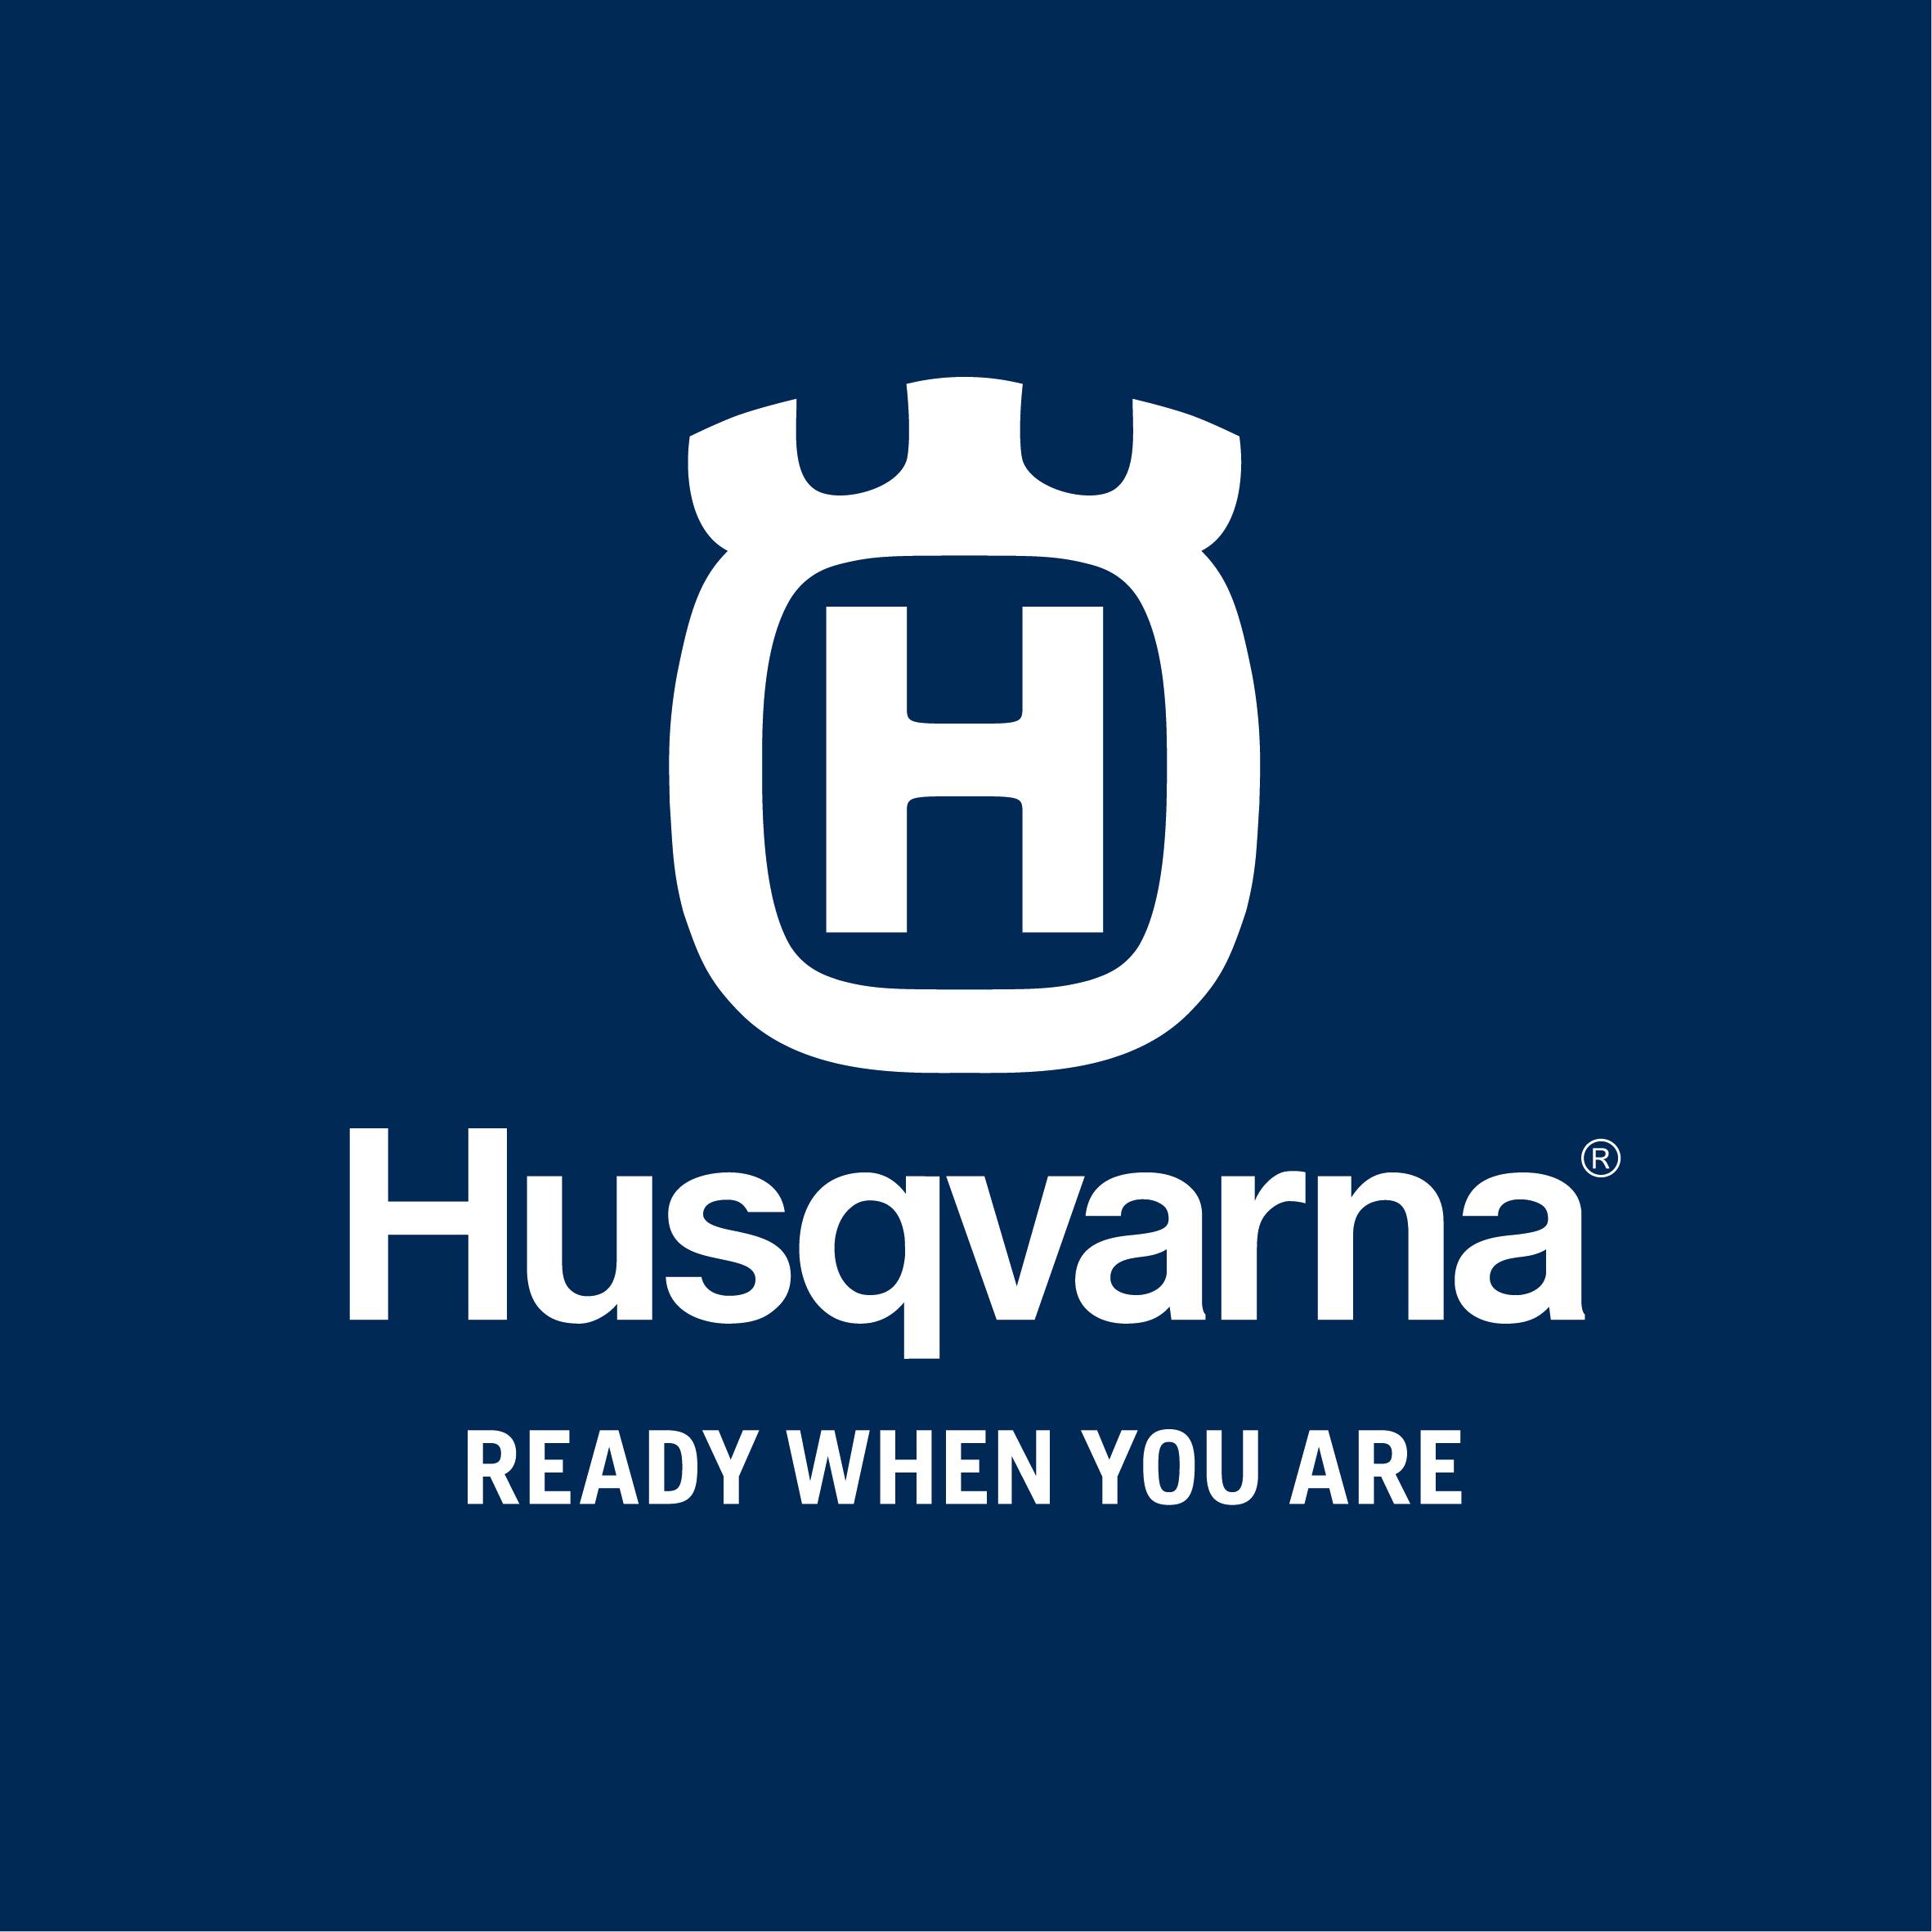 husqvarnagroup.com